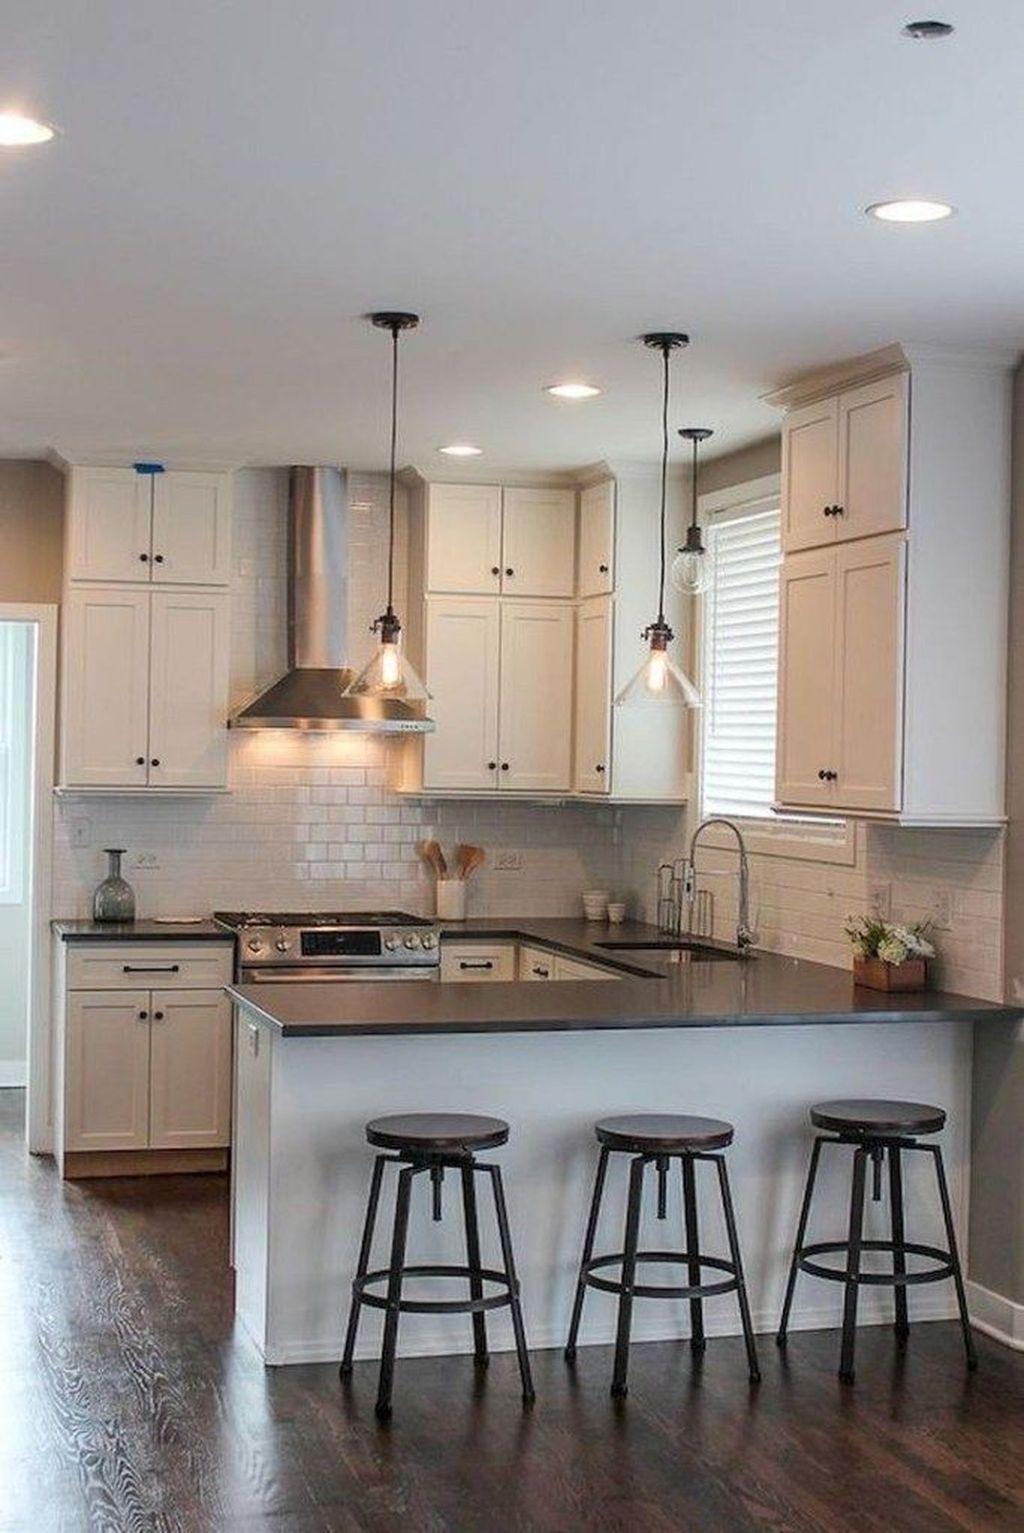 Brilliant Small Kitchen Remodel Design Ideas On A Budget 32